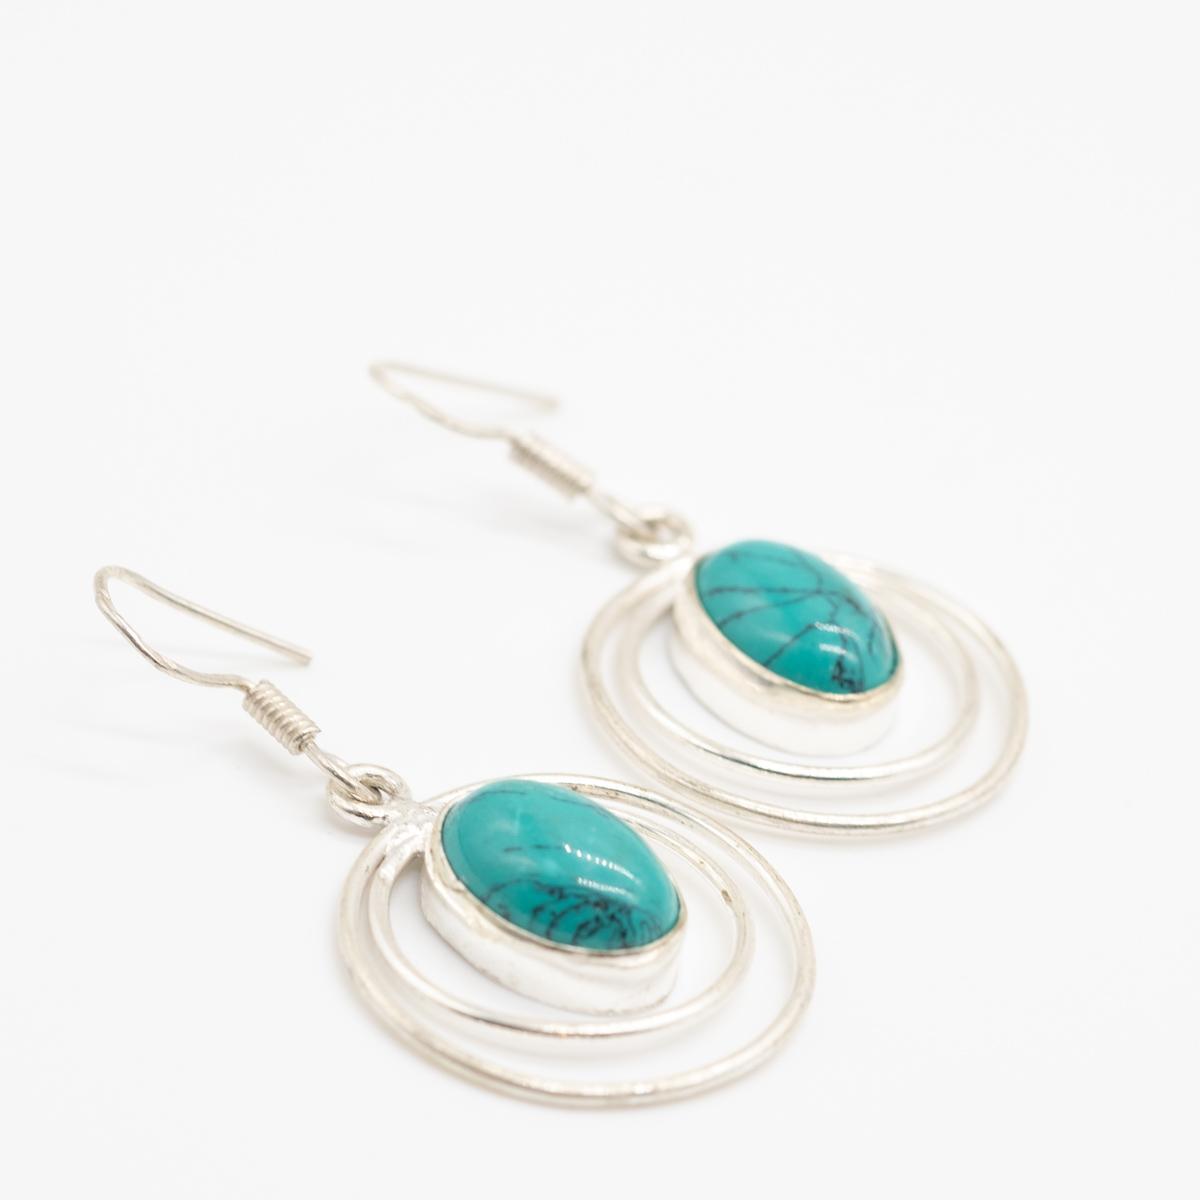 ORB-029 zilver turkoois oorbellen